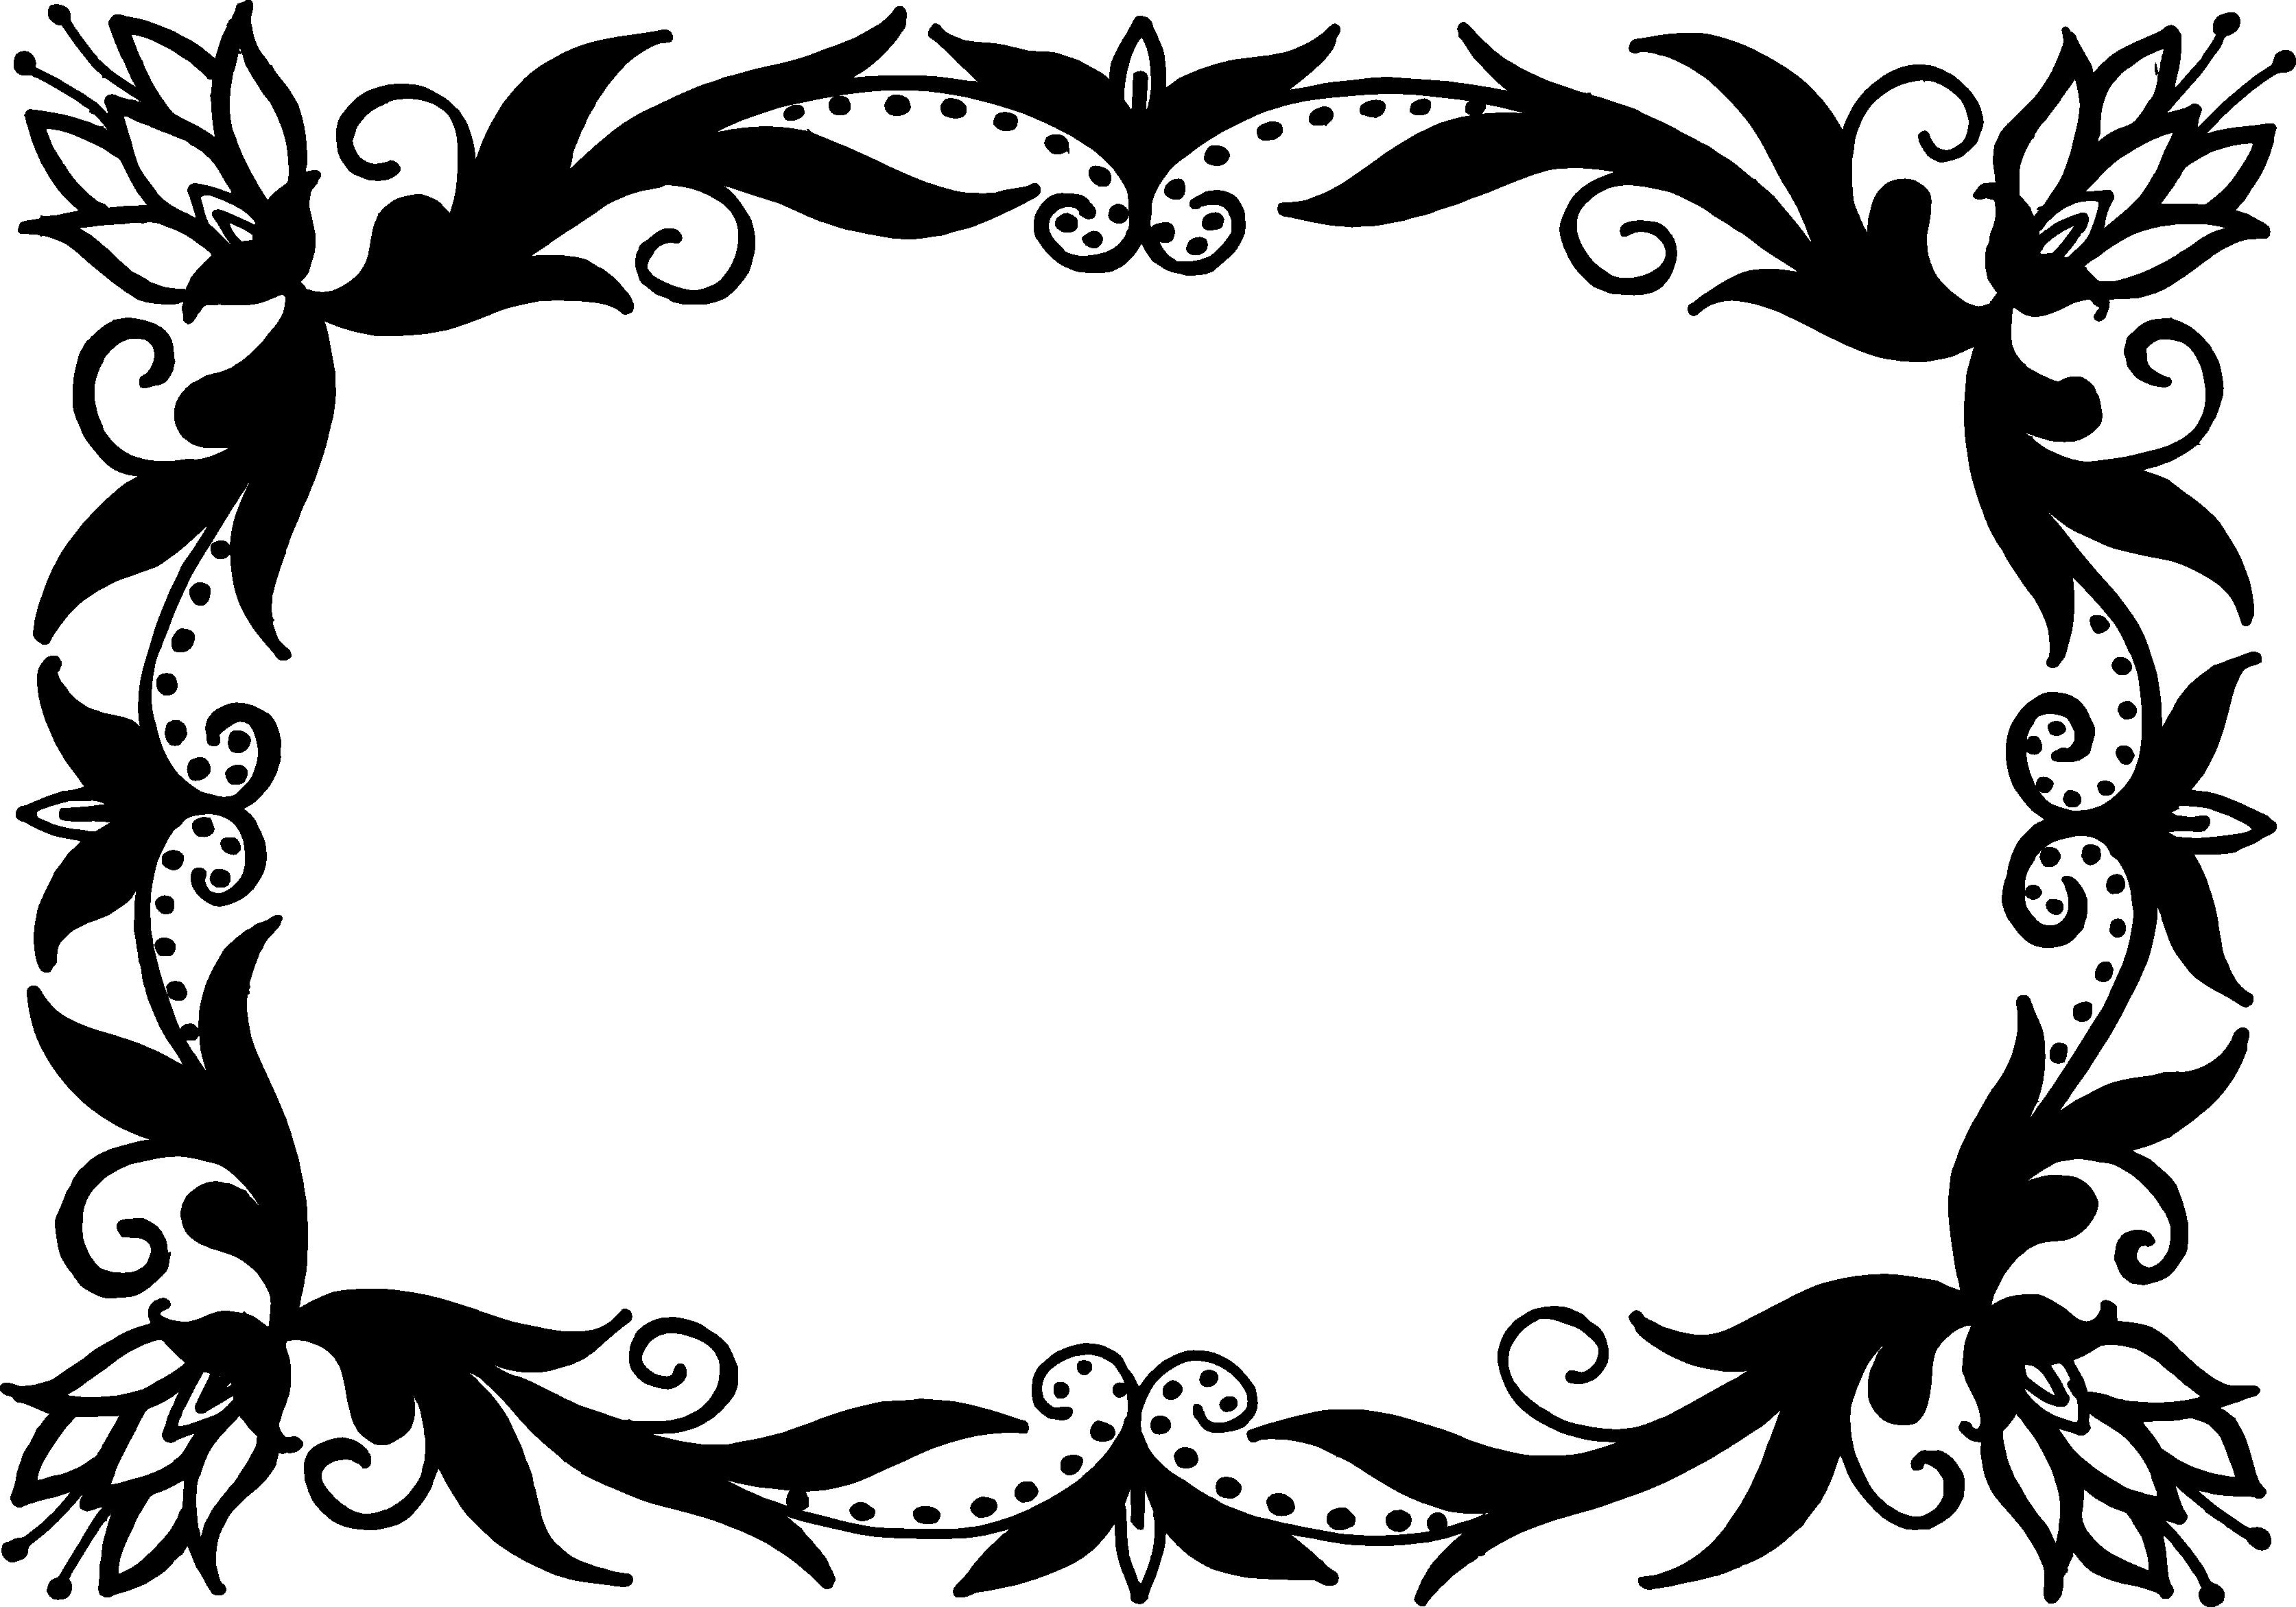 Free Download Png And Vector: 9 Rectangle Flower Frame Vector (PNG Transparent, SVG) Vol